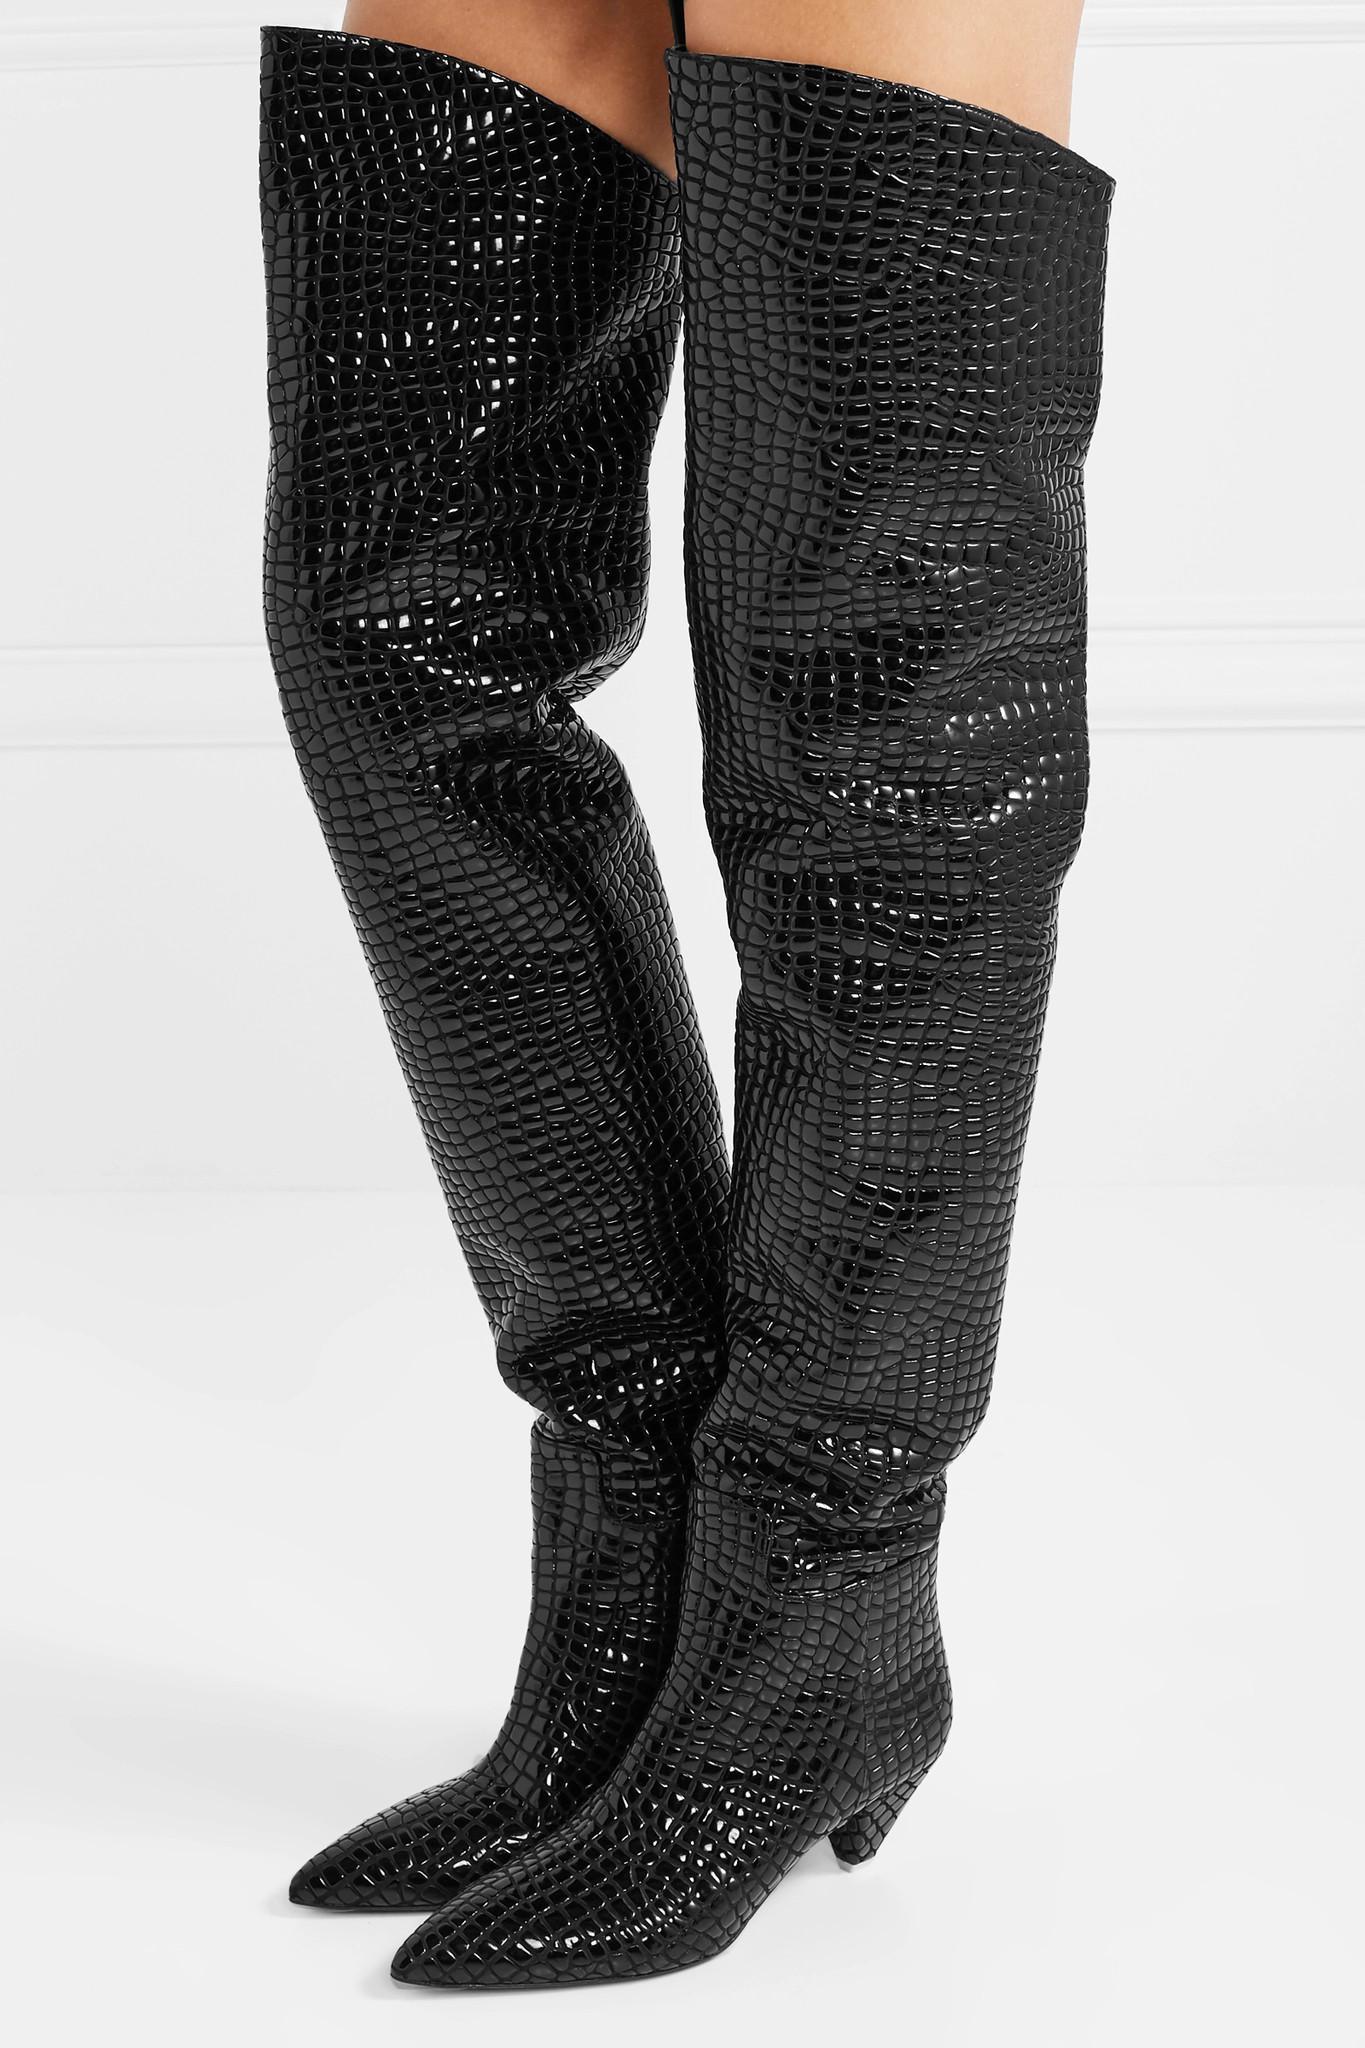 209c4e208c9 Attico - Black Asia Croc-effect Leather Over-the-knee Boots - Lyst. View  fullscreen